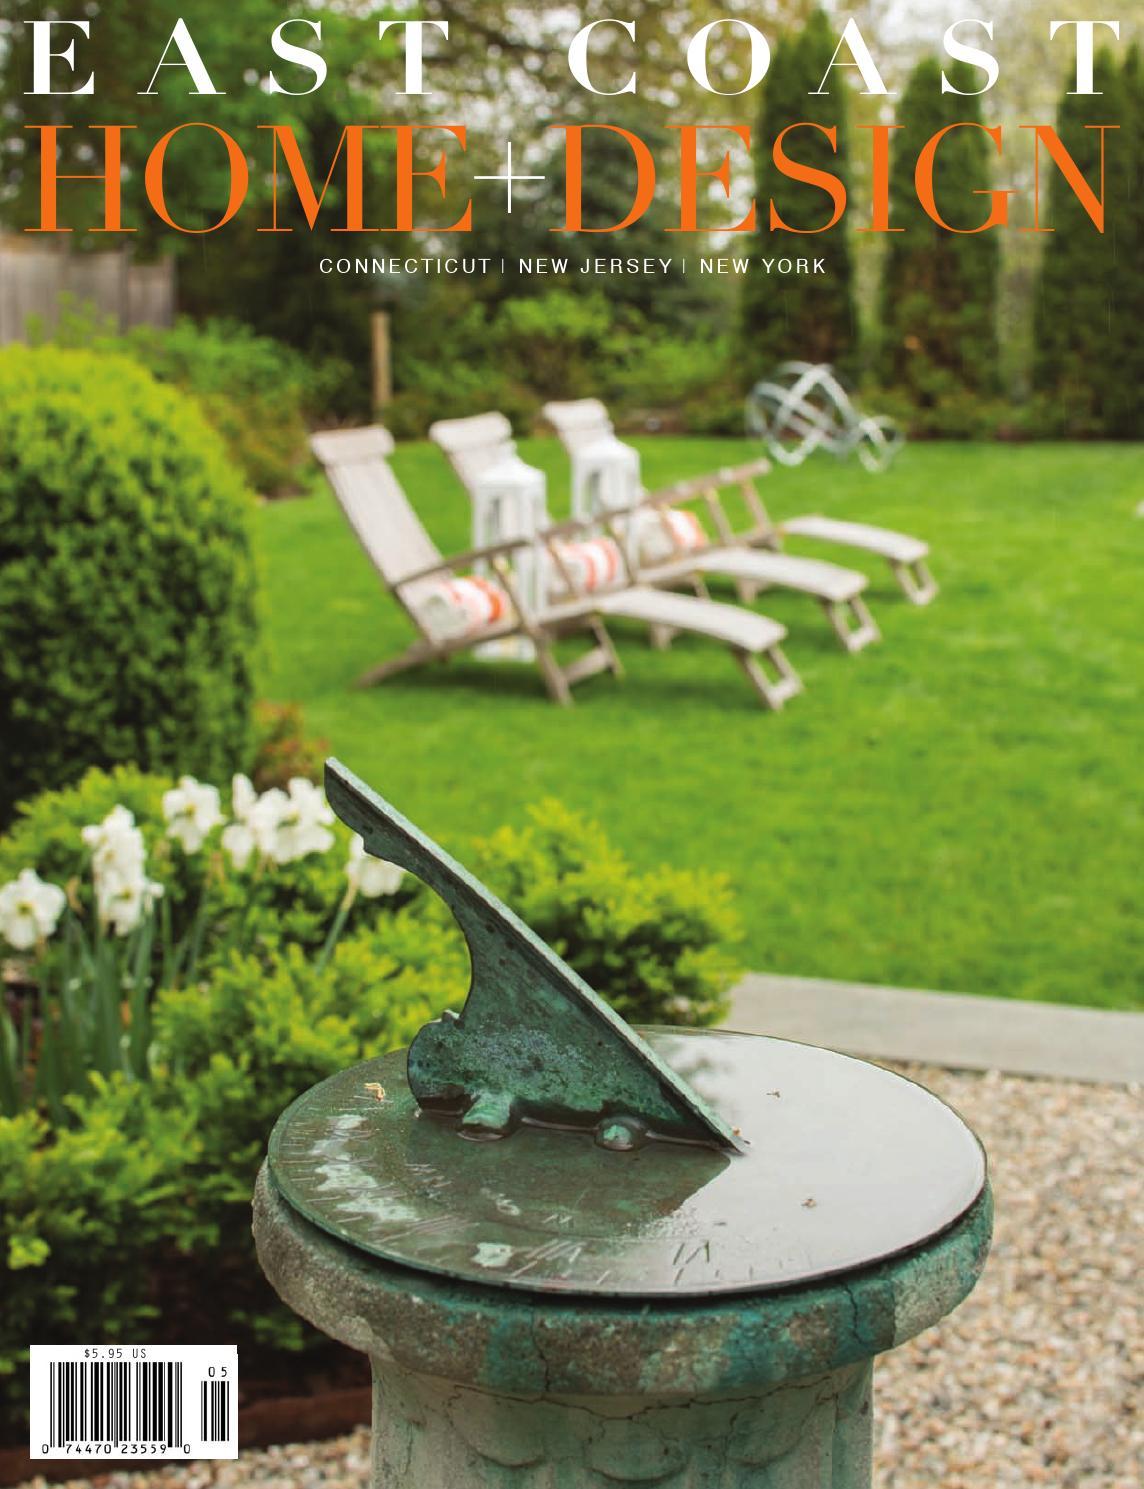 East Coast Home + Design May June 2016 By East Coast Home Publishing   Issuu